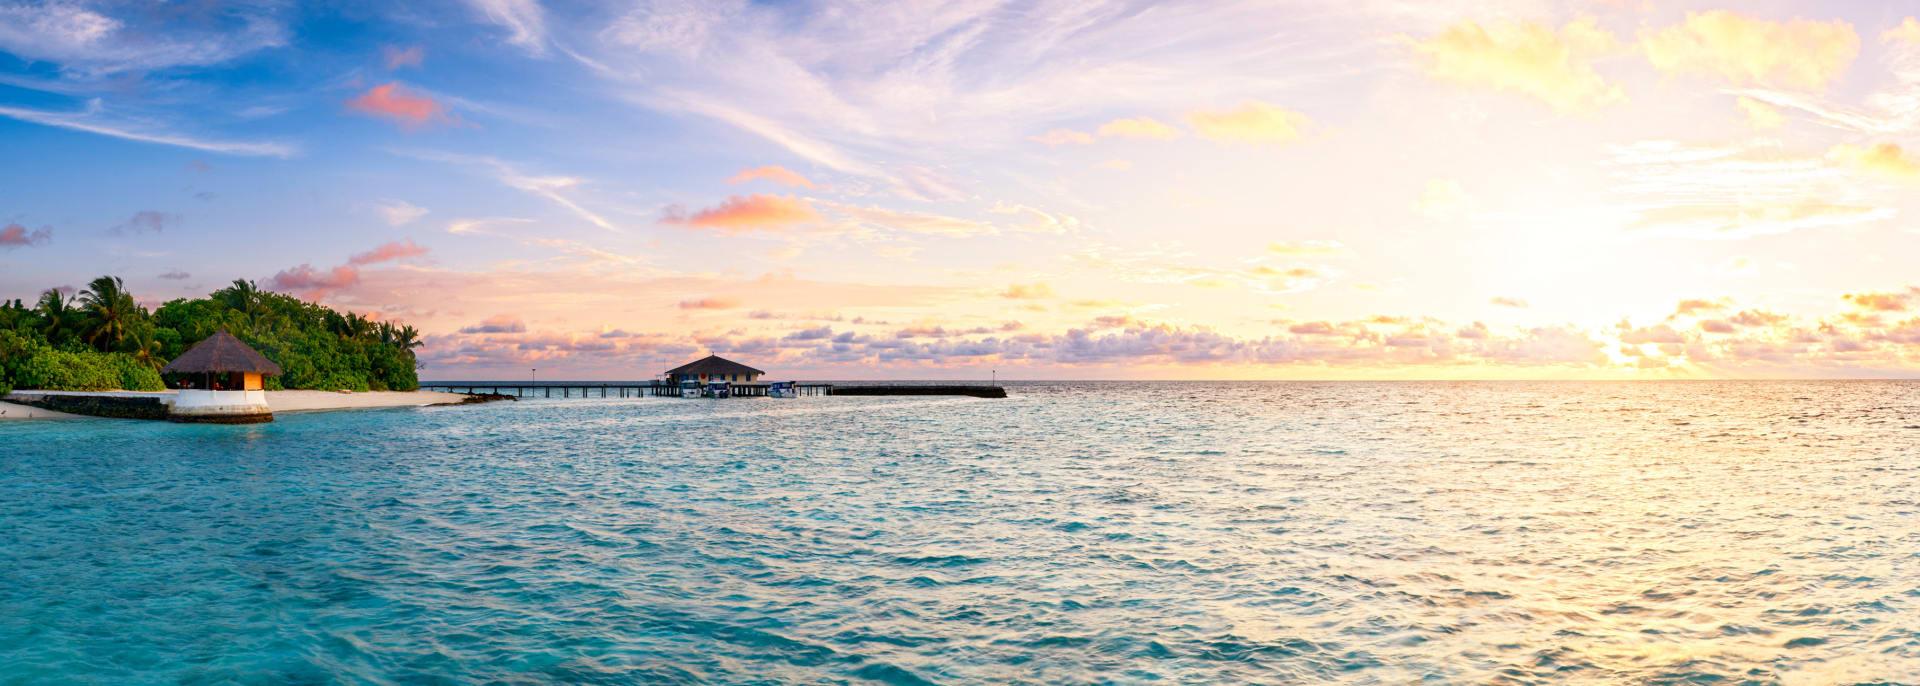 Eriyadu Island Resort, Malediven